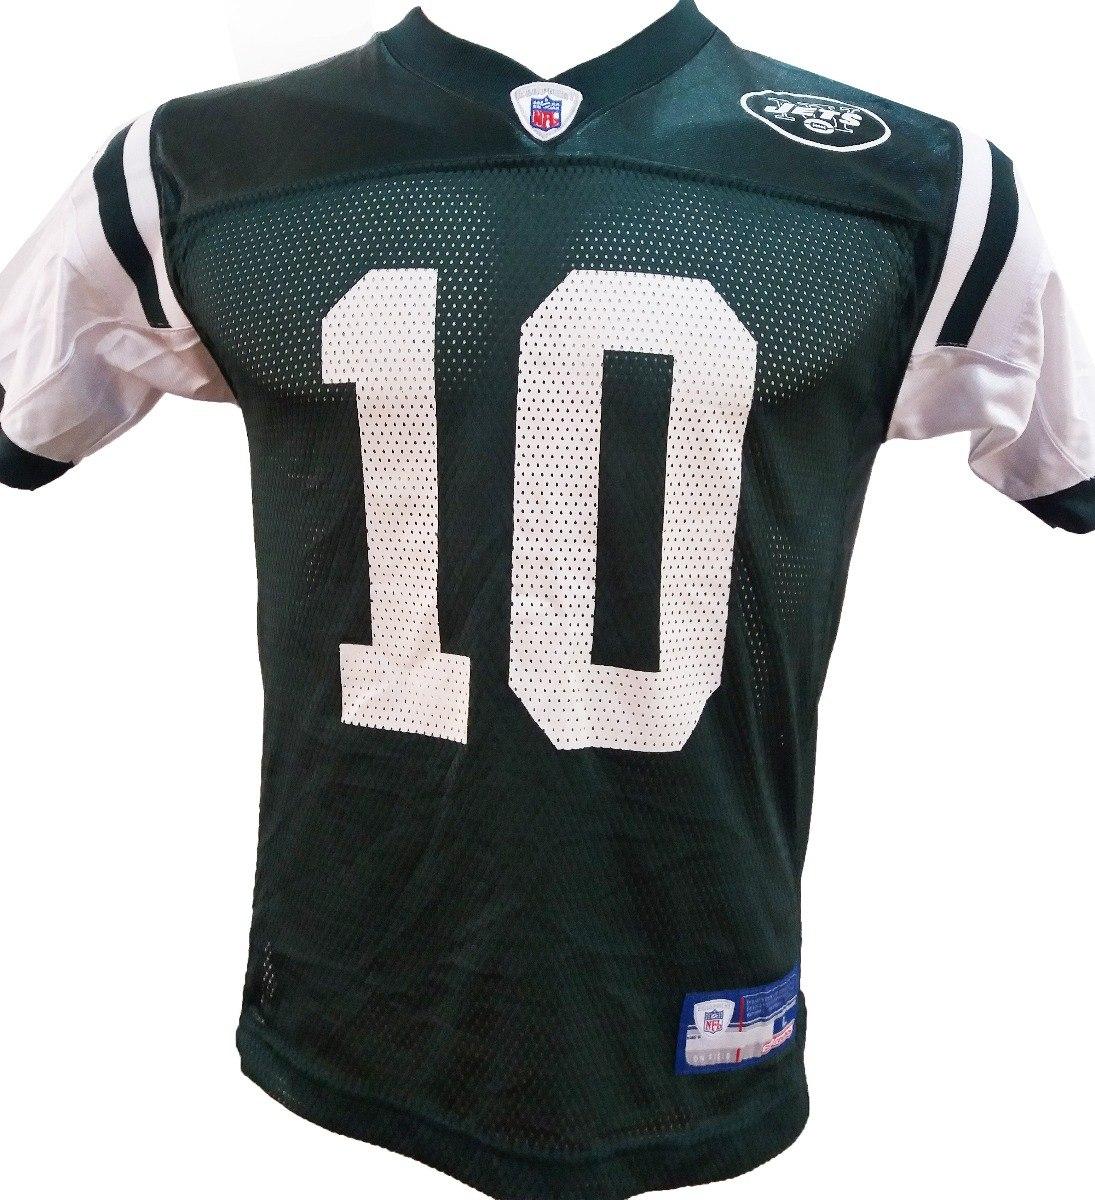 d994775d69e07 camisa futebol americano rebook juvenil pennington tamanho g. Carregando  zoom.